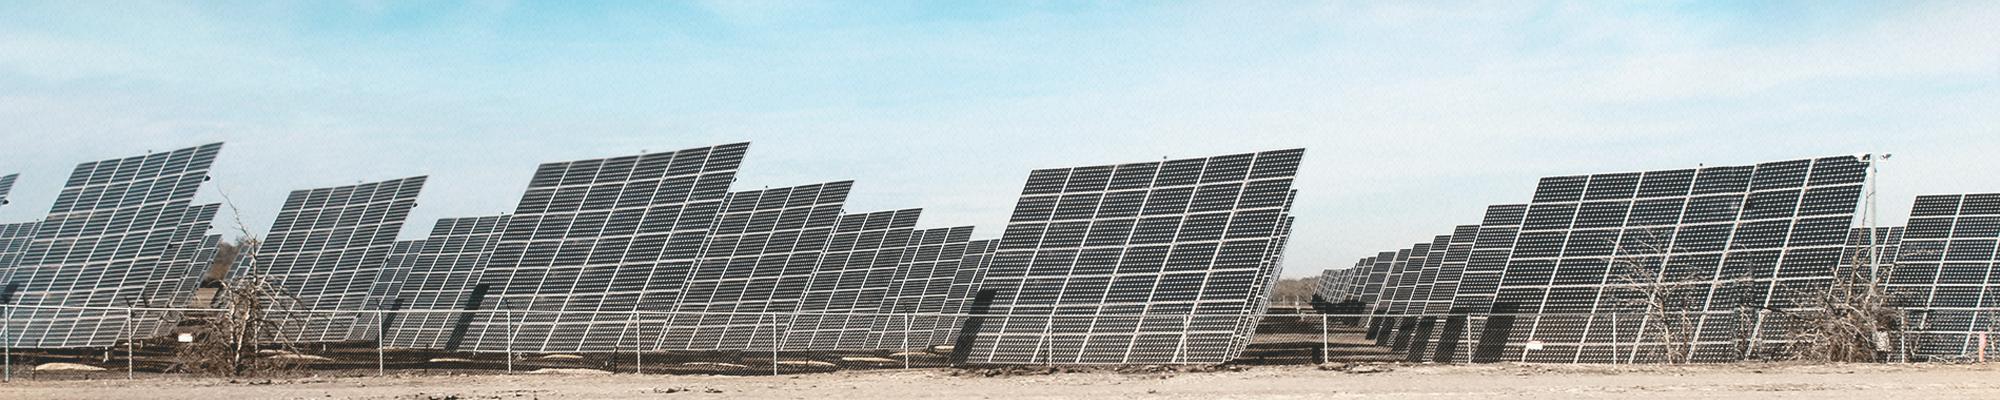 PARU World Solar Energy Installation